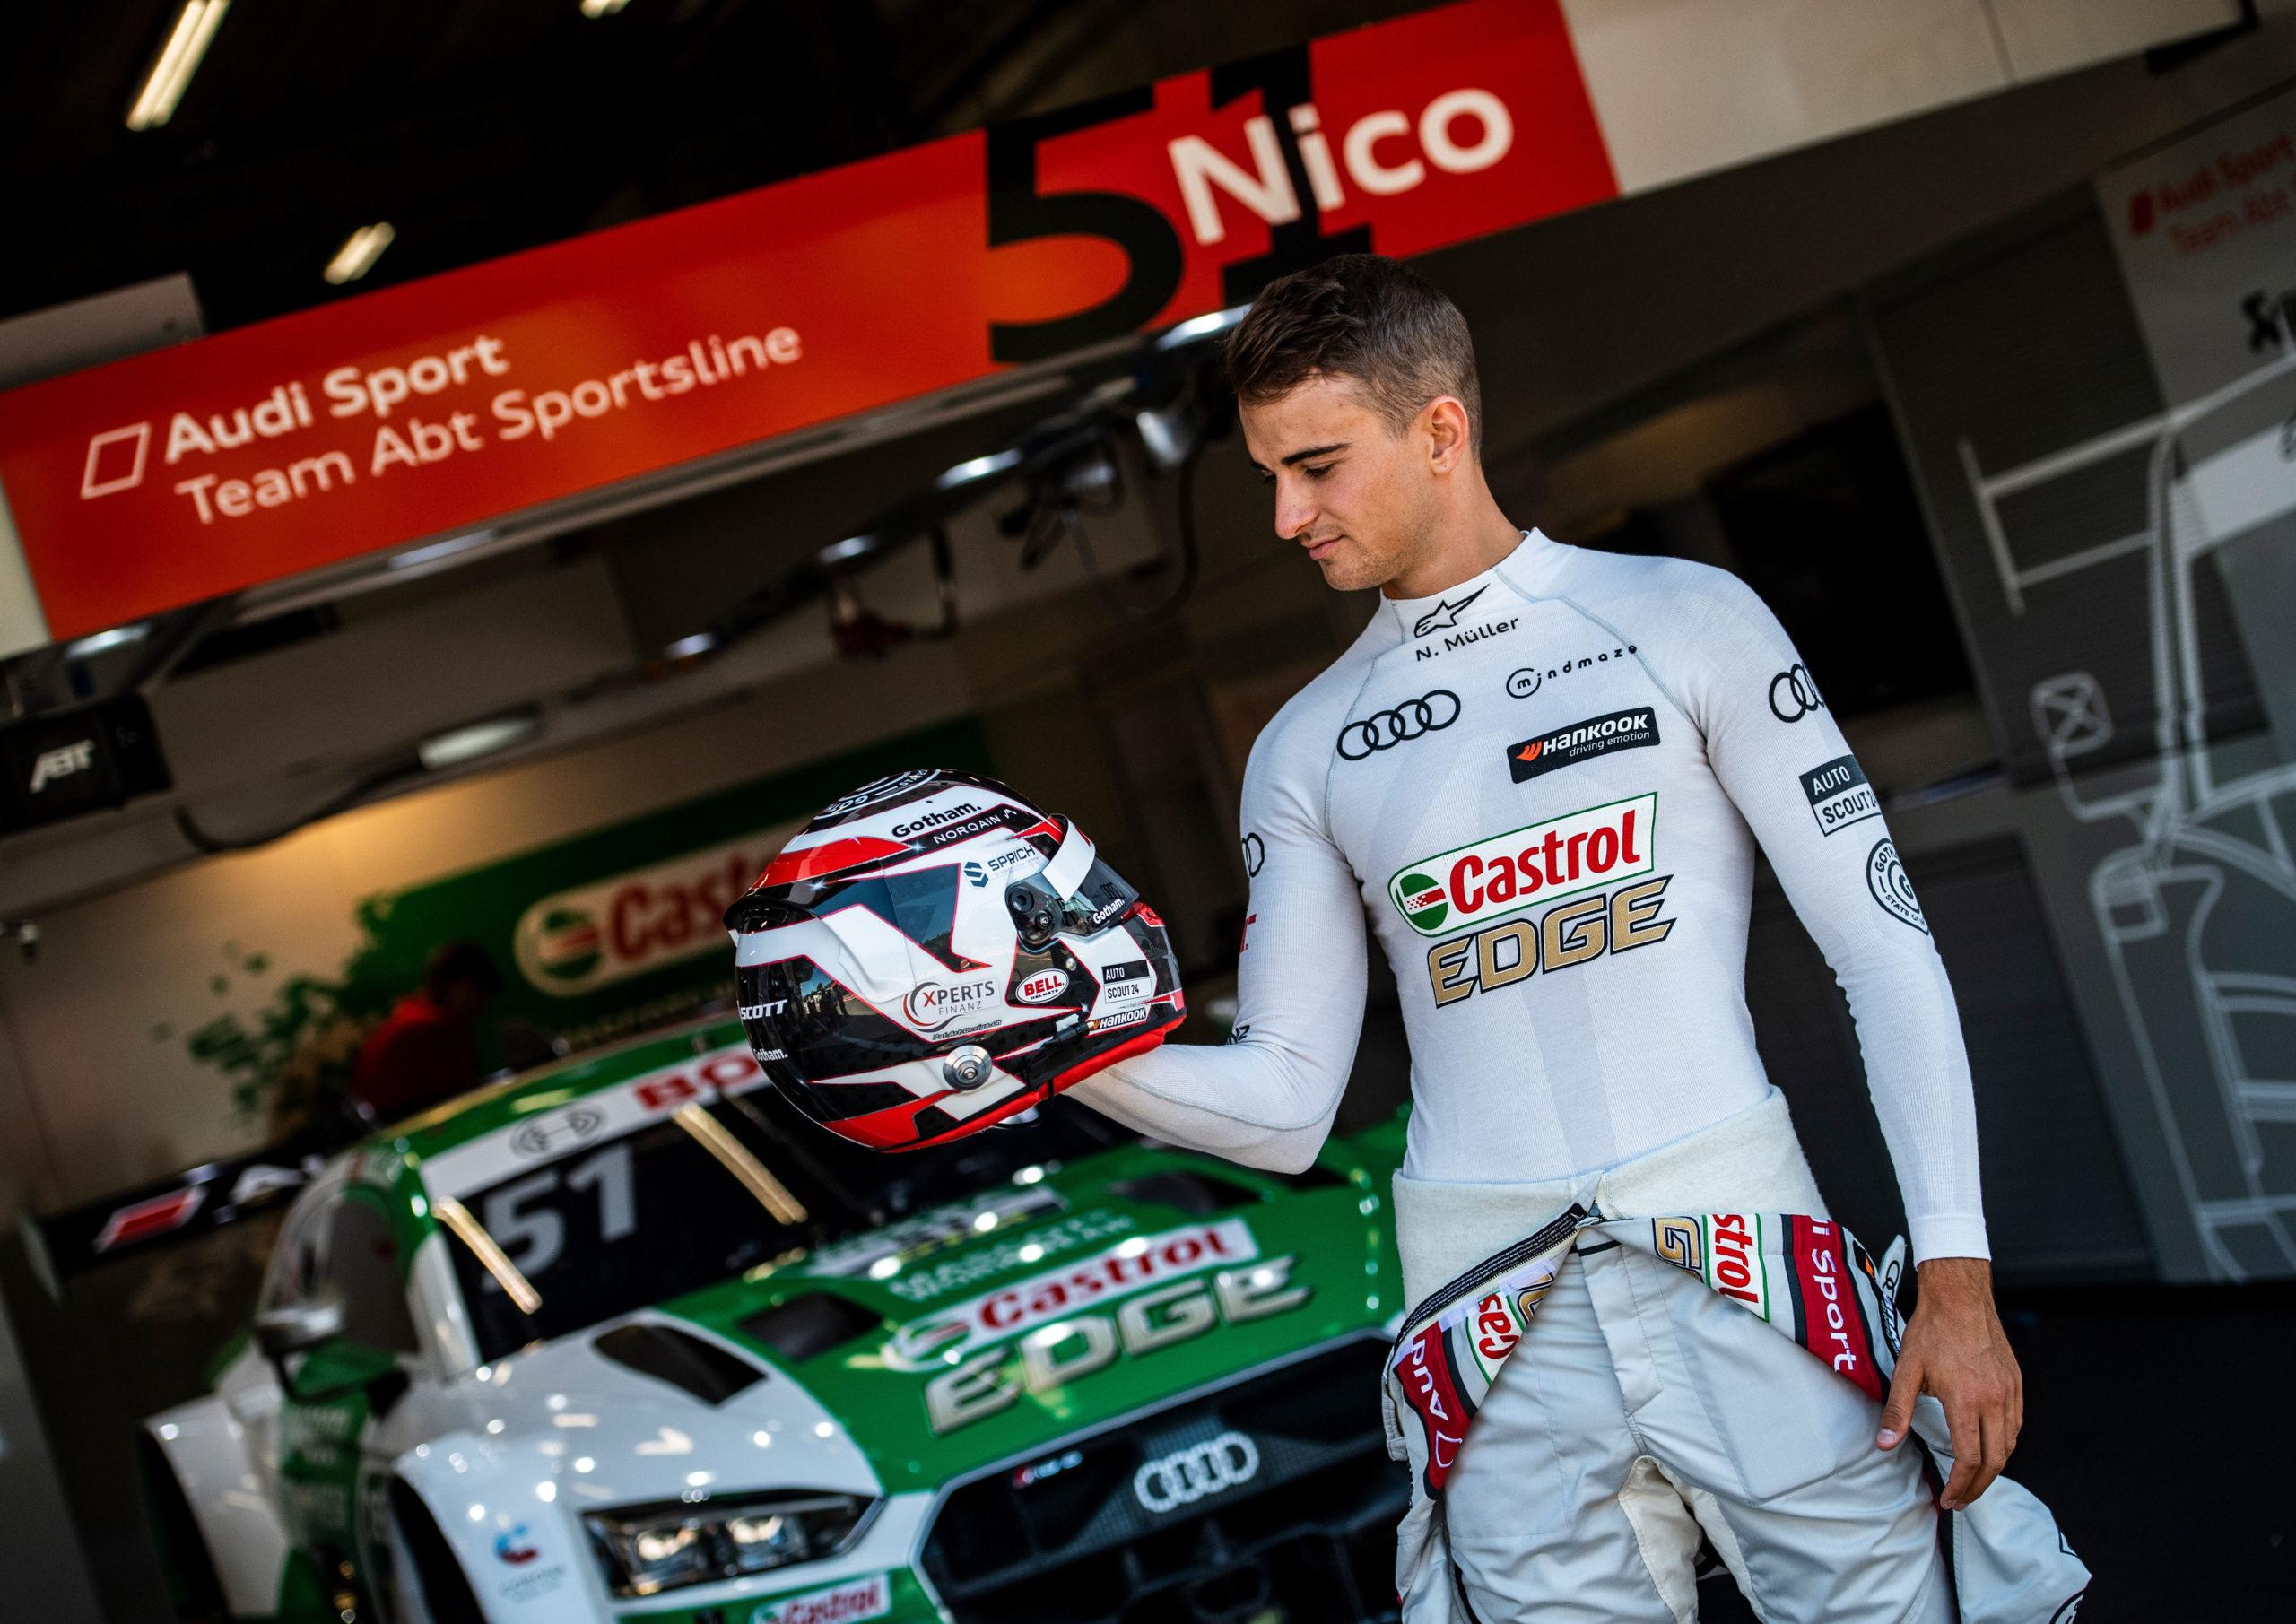 Nico Müller encabeza el repóquer de Audi en Spa-Francorchamps